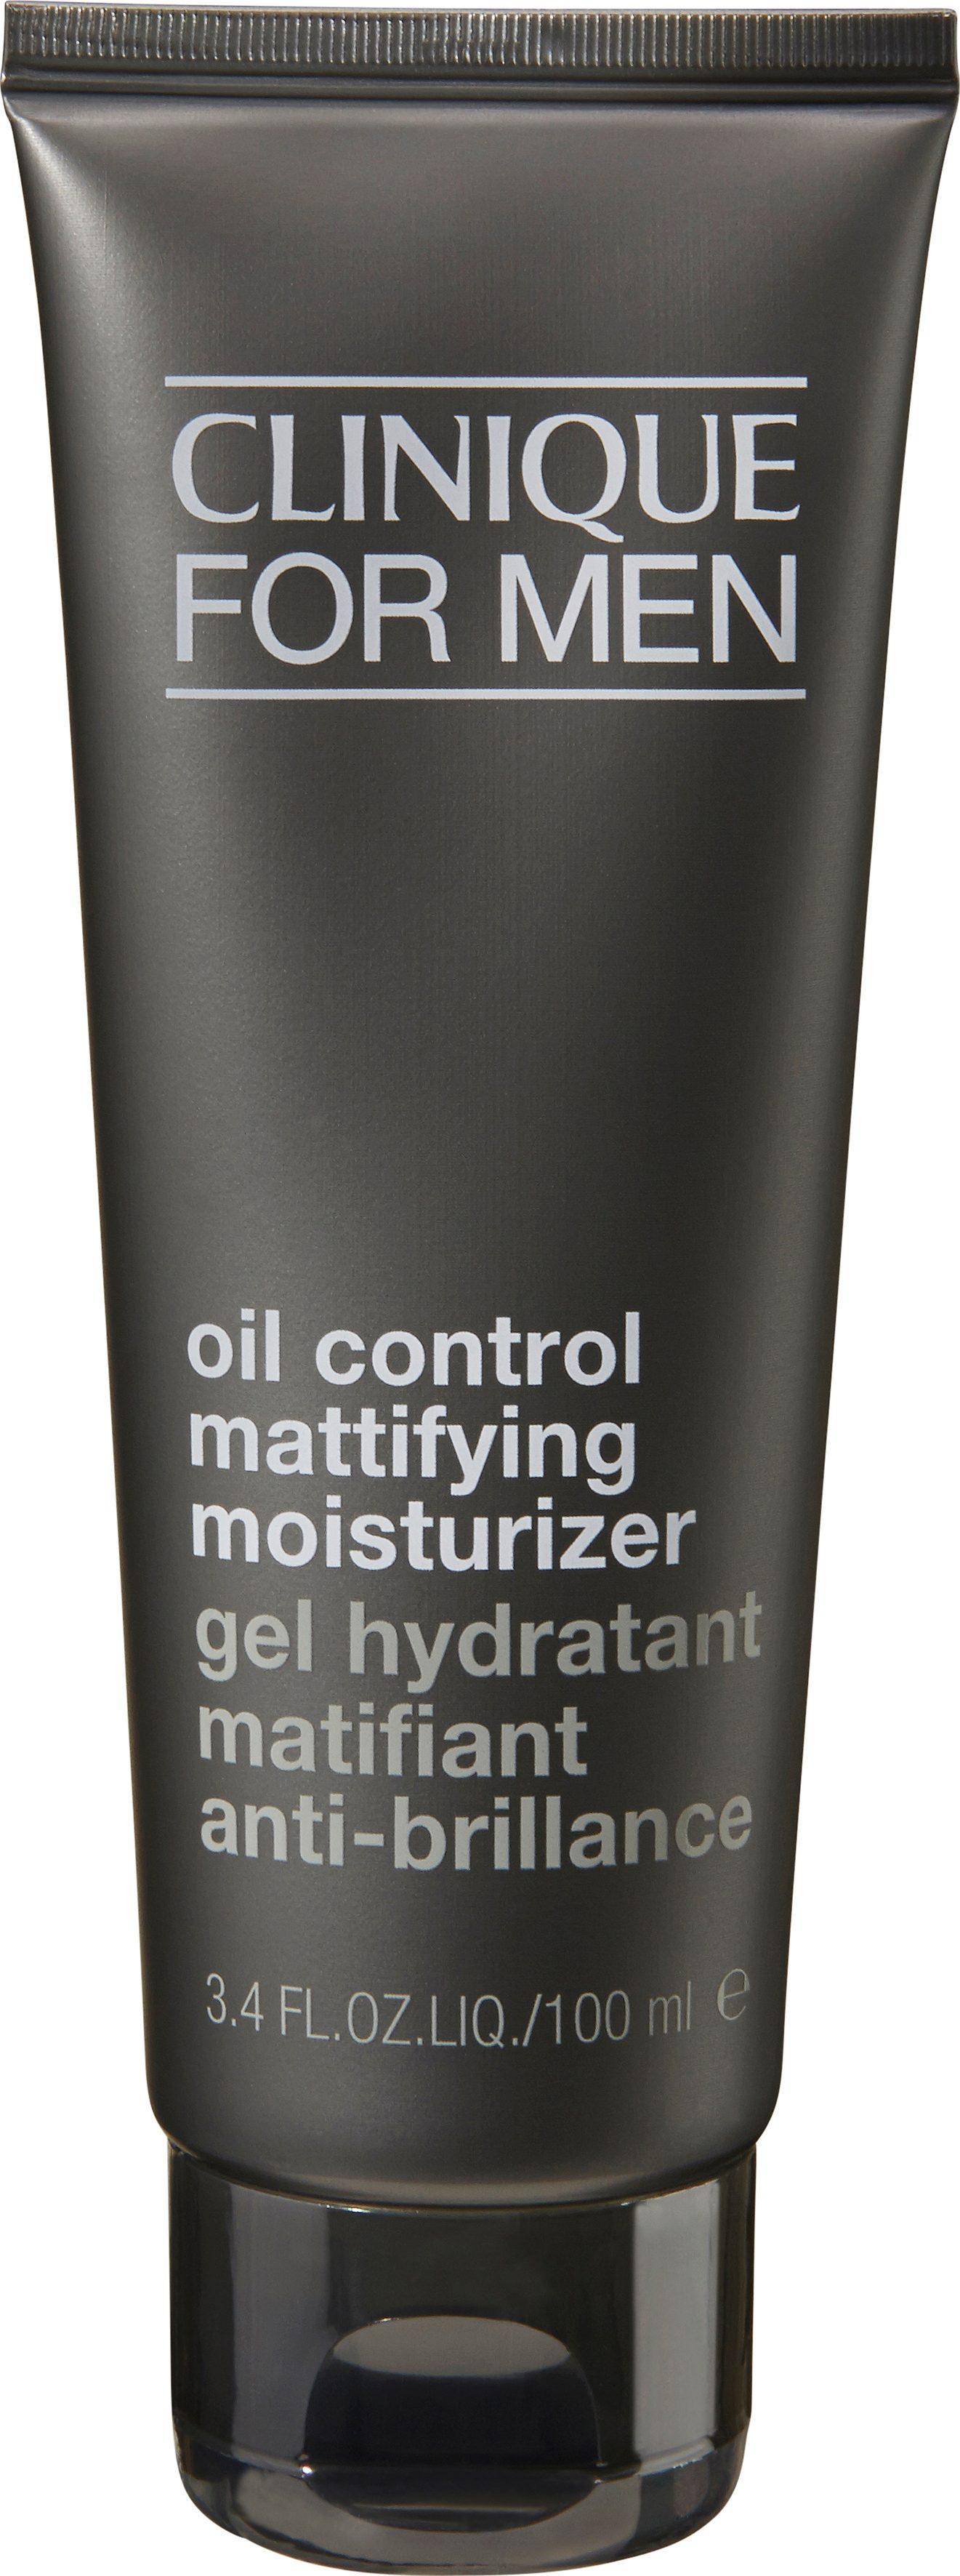 Clinique, »Oil Control Mattifying Moisturizer«, Gesichtsgel